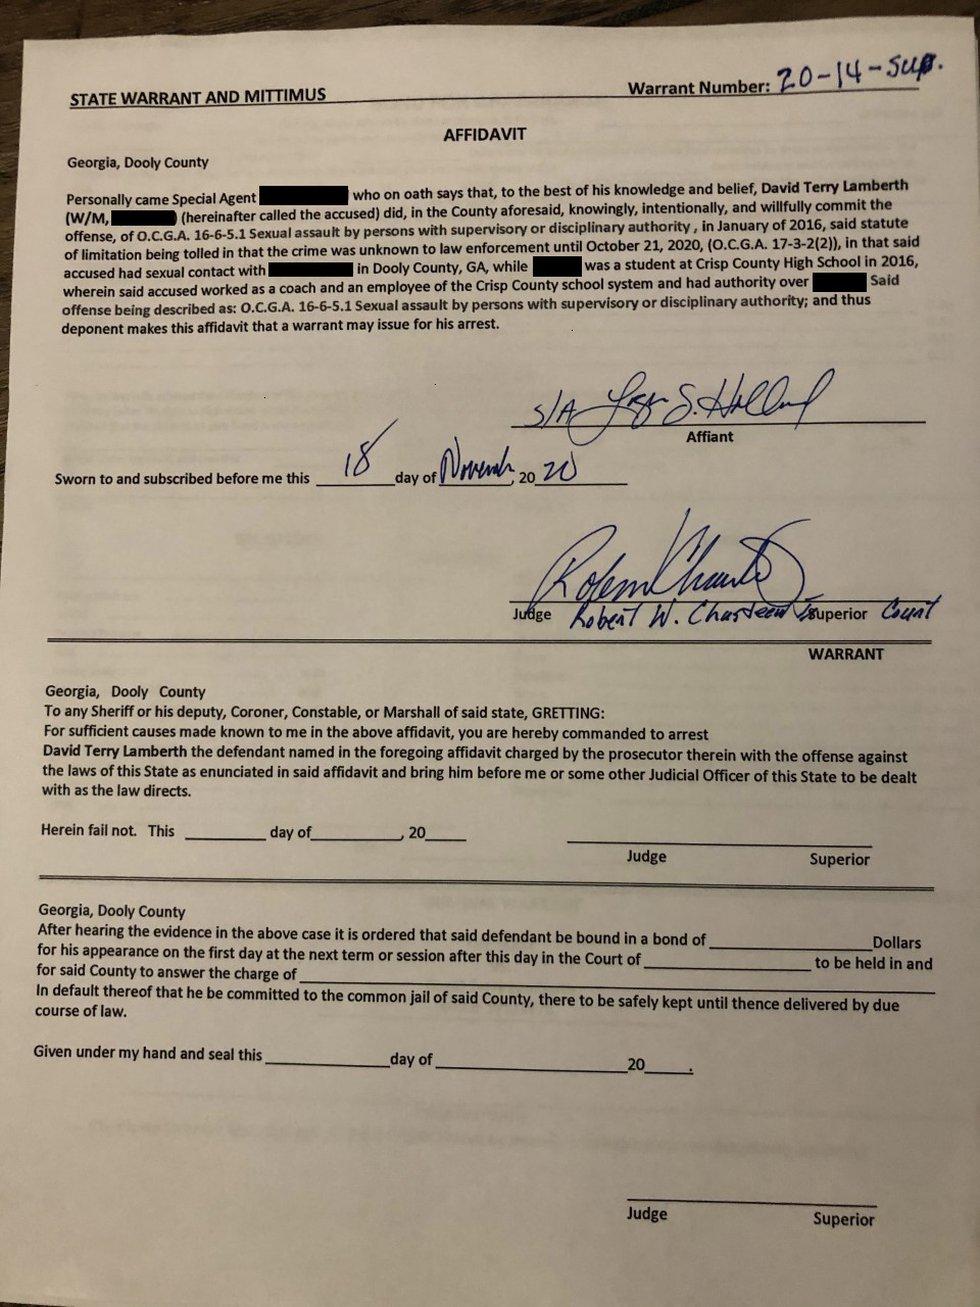 A copy of the arrest warrant issued against former Crisp County baseball coach David Lamberth....